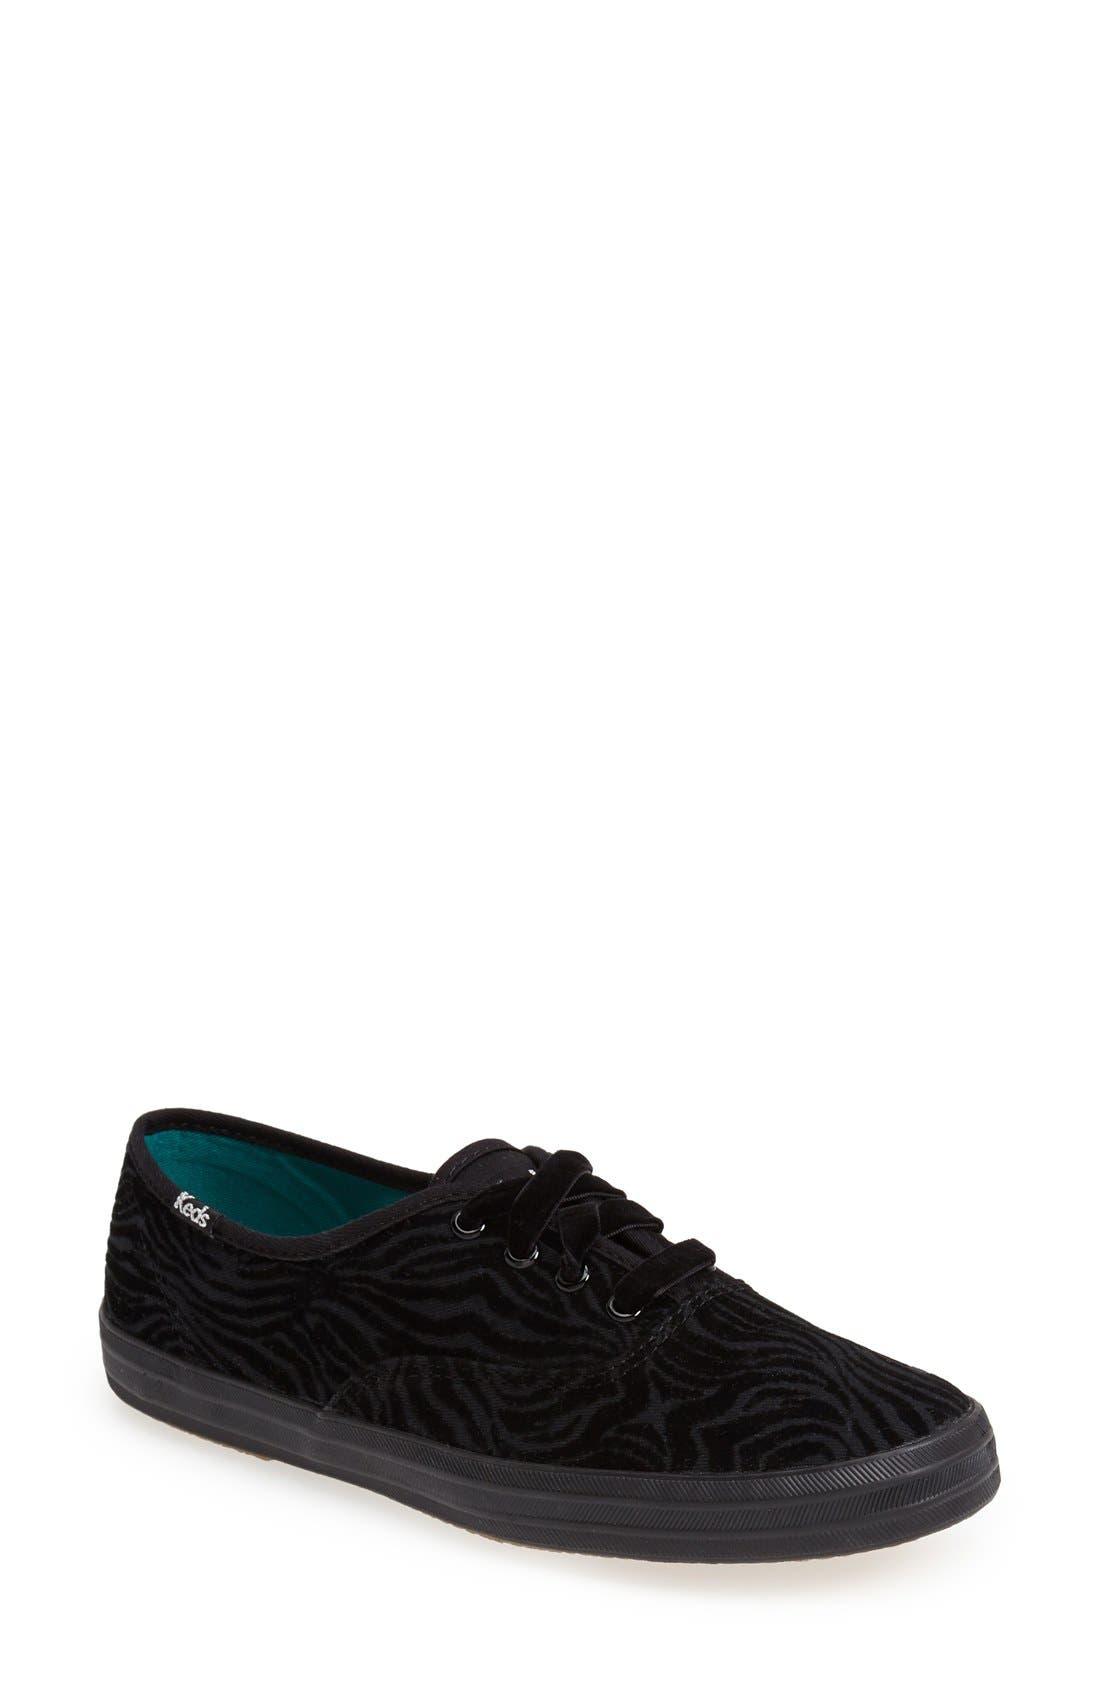 Main Image - Keds® 'Champion - Zebra Stripe' Sneaker (Women)